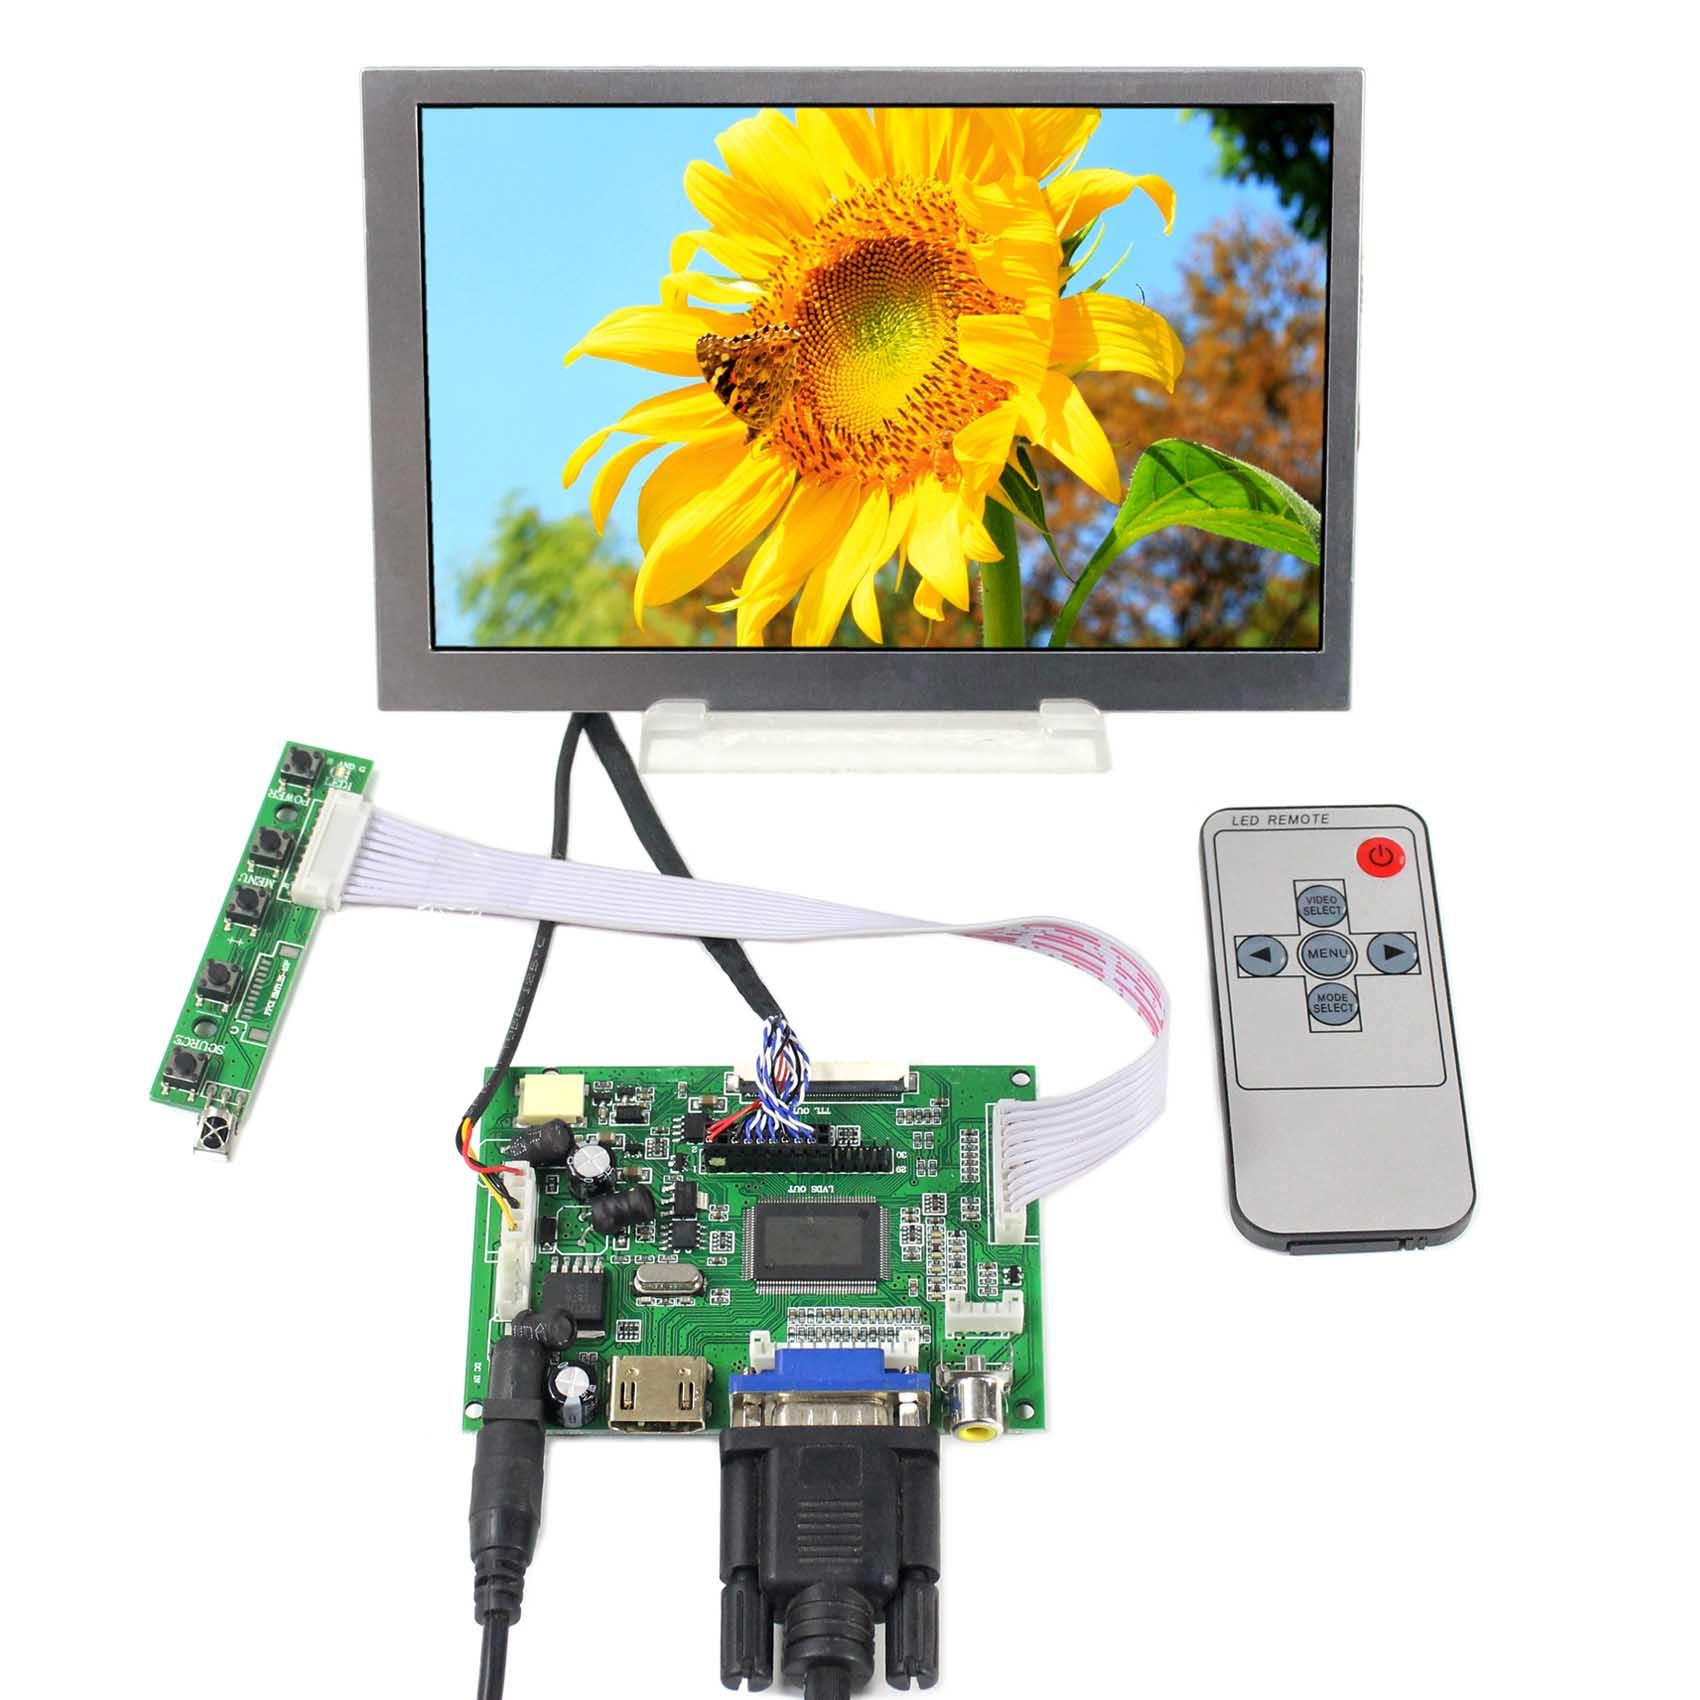 7 polegada g070vw01 v0 800x480 tela lcd com hd mi vga + 2av lcd placa de controlador VS-TY2662-V1